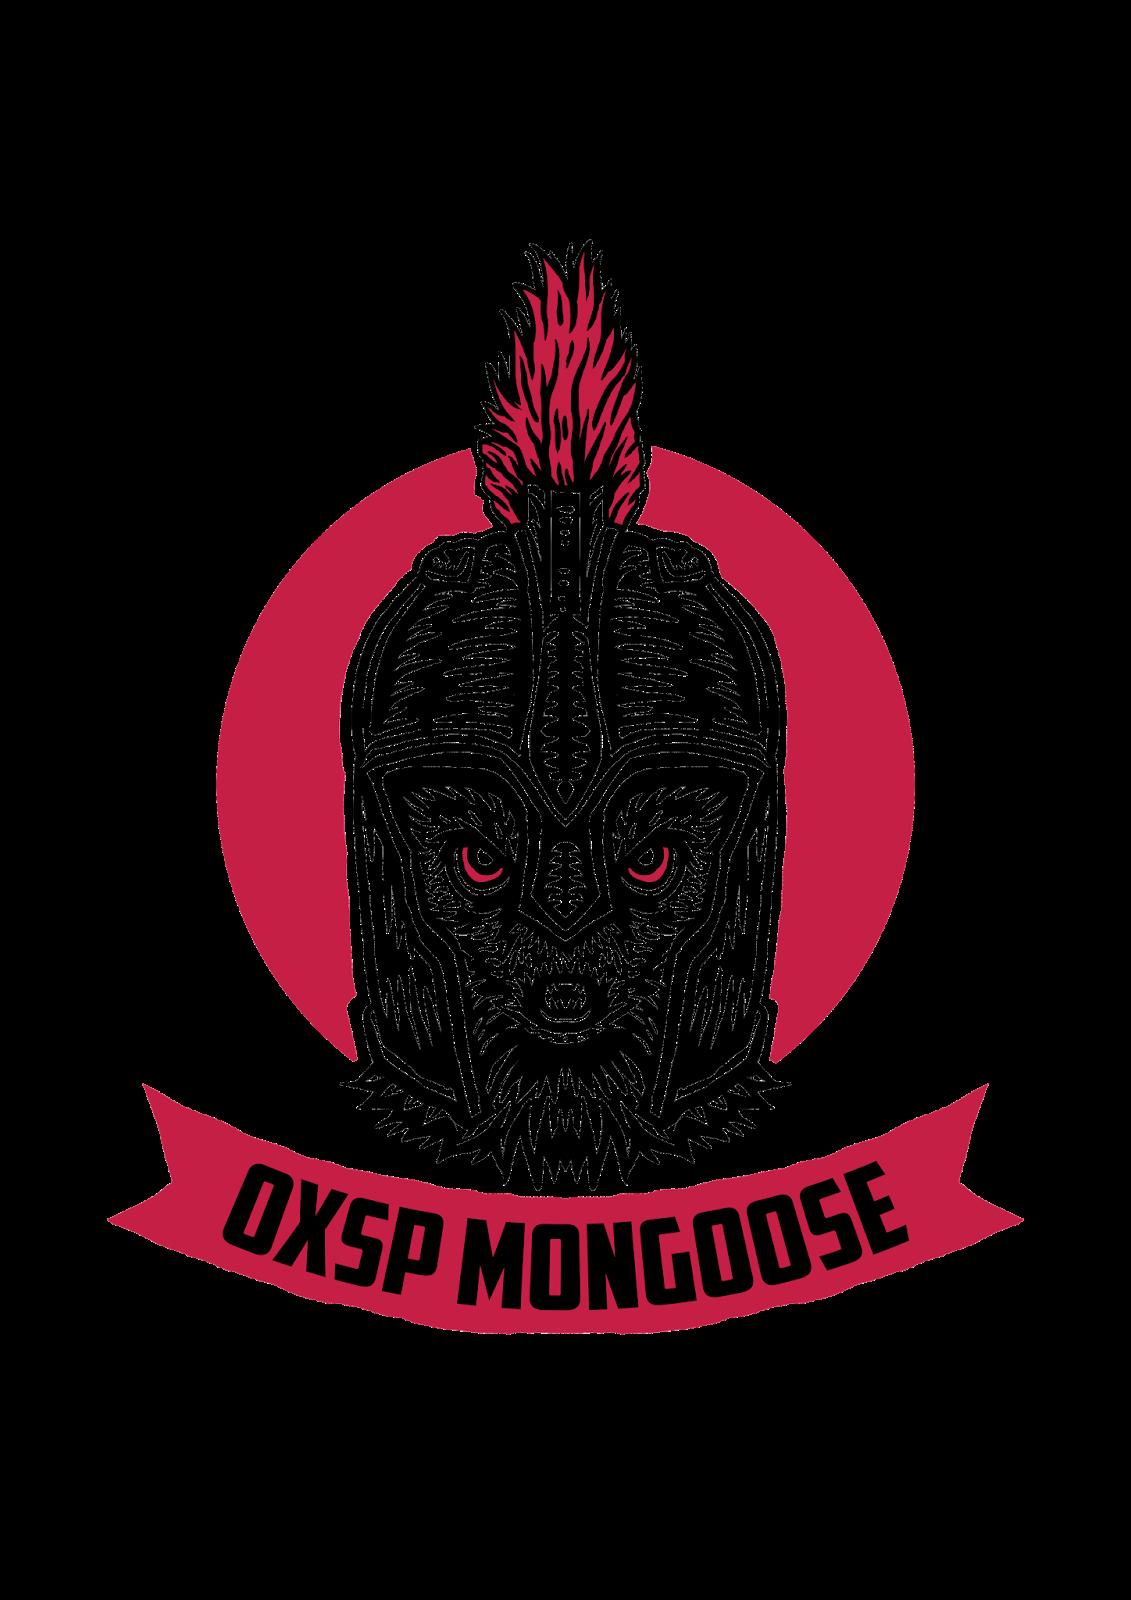 0xsp-Mongoose - Privilege Escalation Enumeration Toolkit (ELF 64/32), Fast, Intelligent Enumeration With Web API Integration